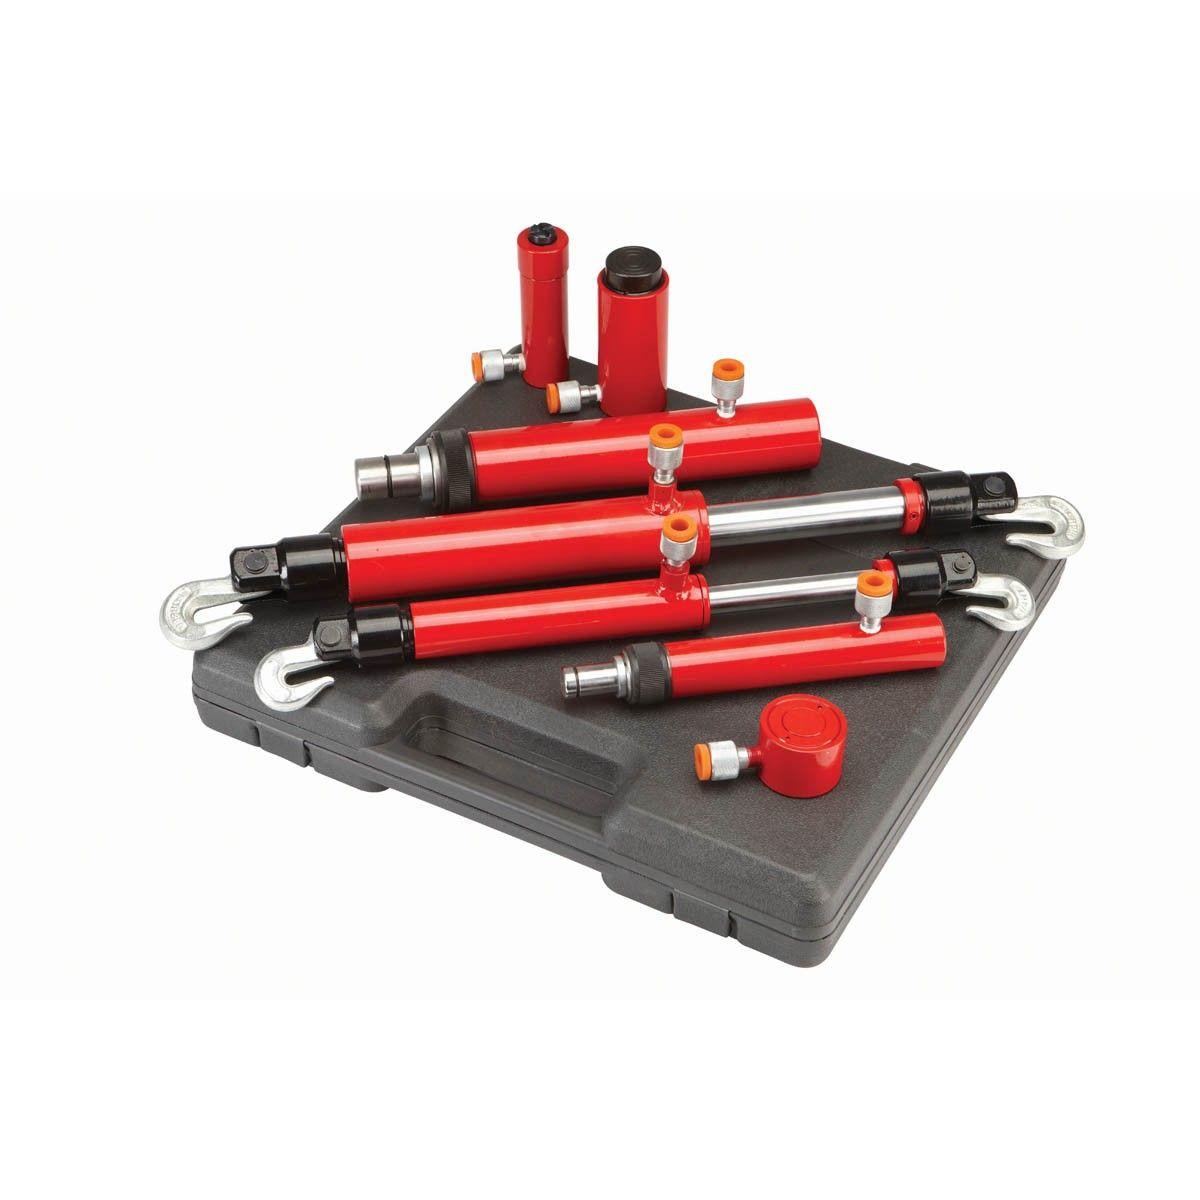 Hydraulic Auto Body Frame Repair Kit 7 Pc In 2020 Auto Body Auto Body Repair Repair